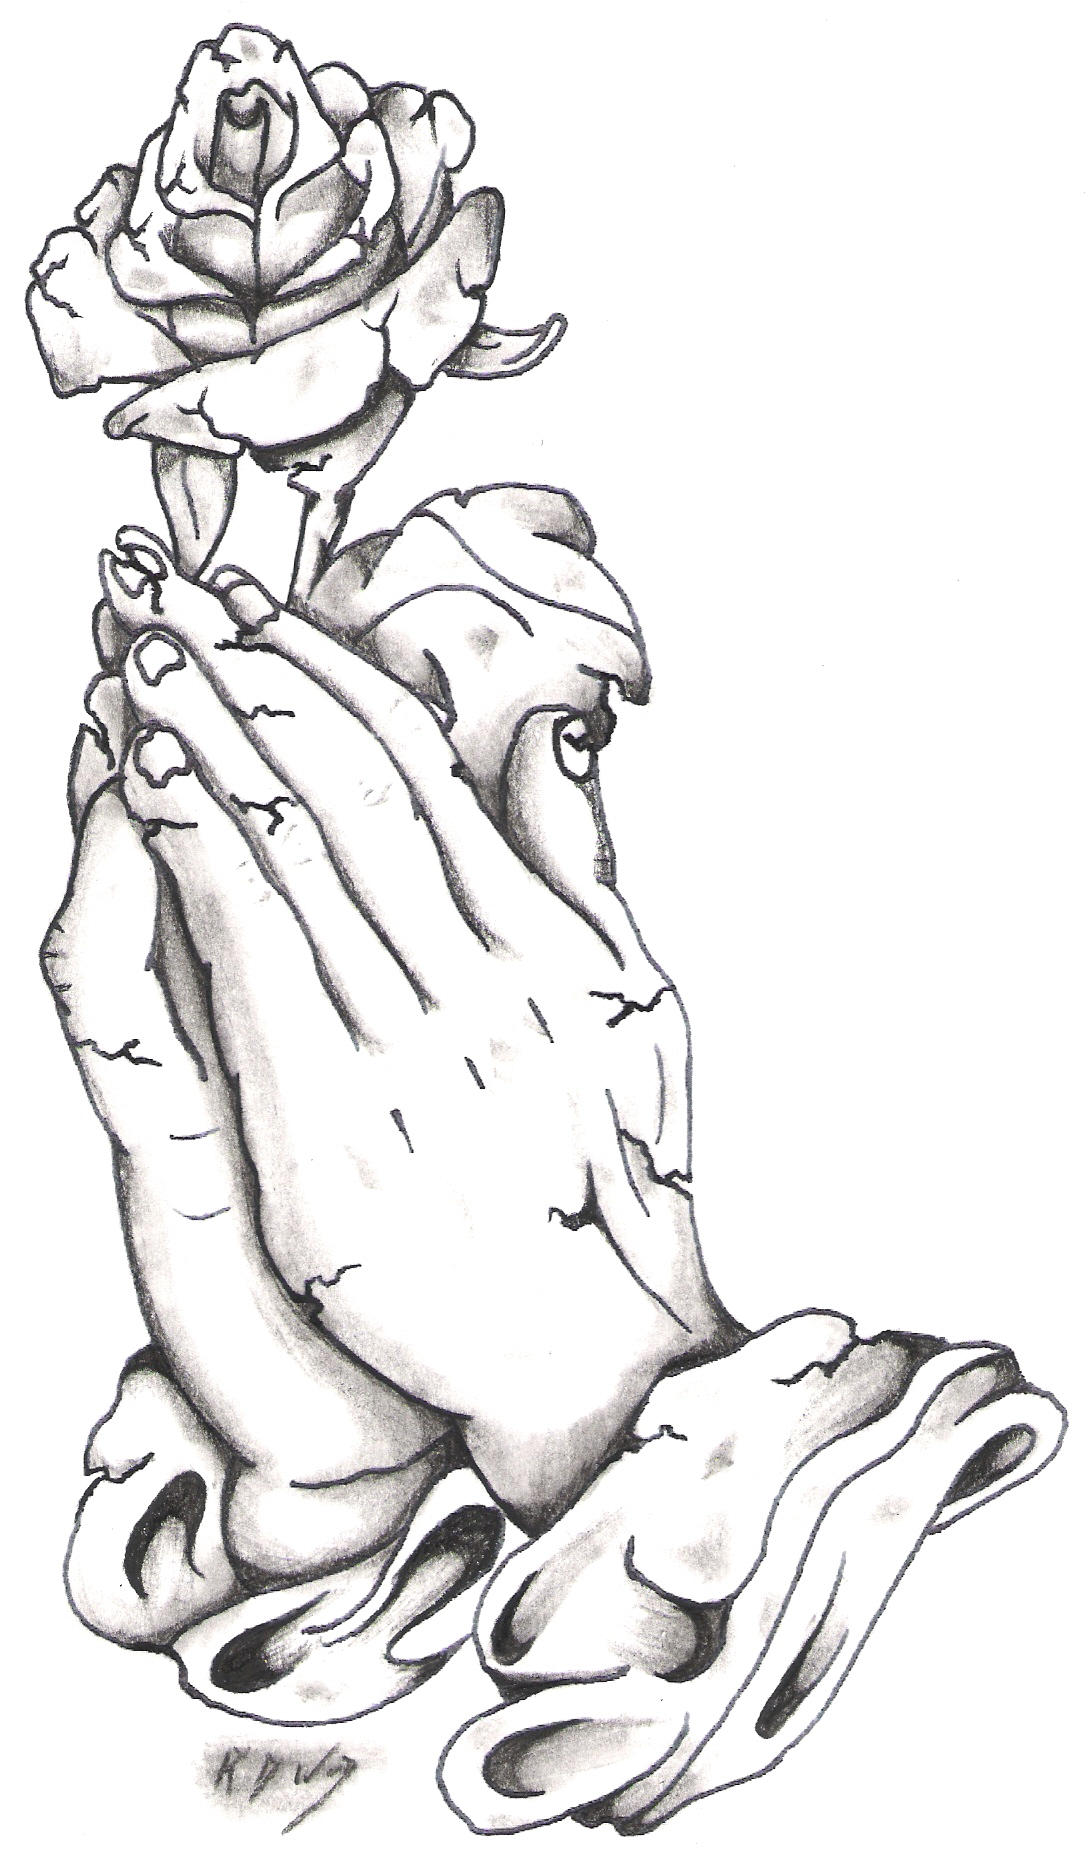 stone praying hands and rose by bassplayer39 on deviantart. Black Bedroom Furniture Sets. Home Design Ideas